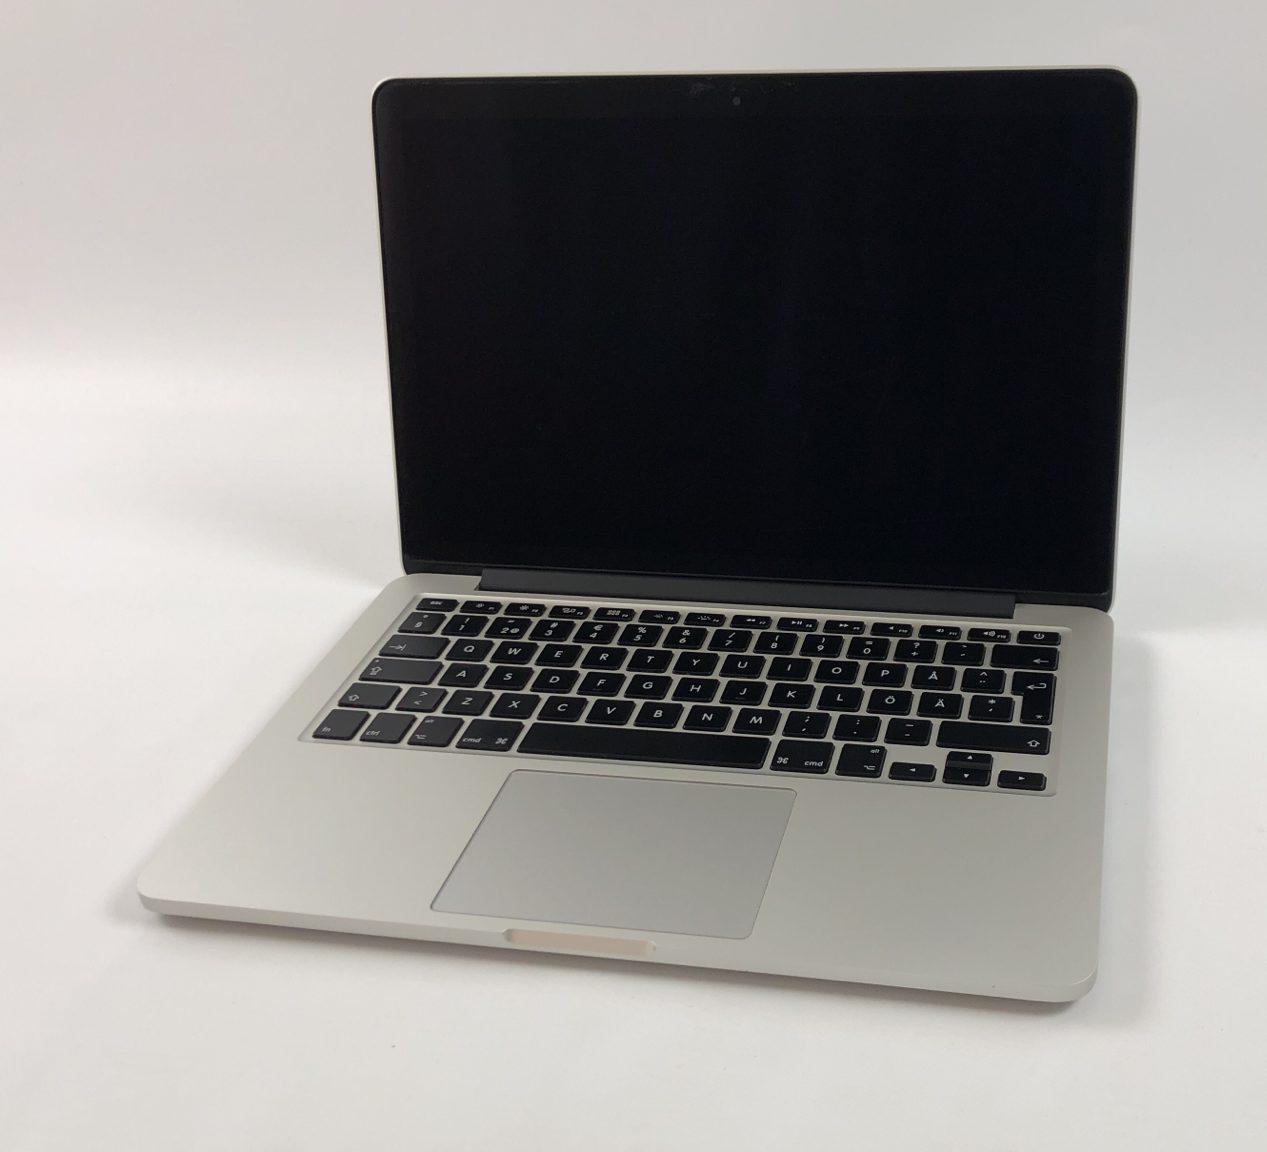 "MacBook Pro Retina 13"" Early 2015 (Intel Core i5 2.7 GHz 16 GB RAM 128 GB SSD), Intel Core i5 2.7 GHz, 16 GB RAM, 128 GB SSD, Kuva 1"